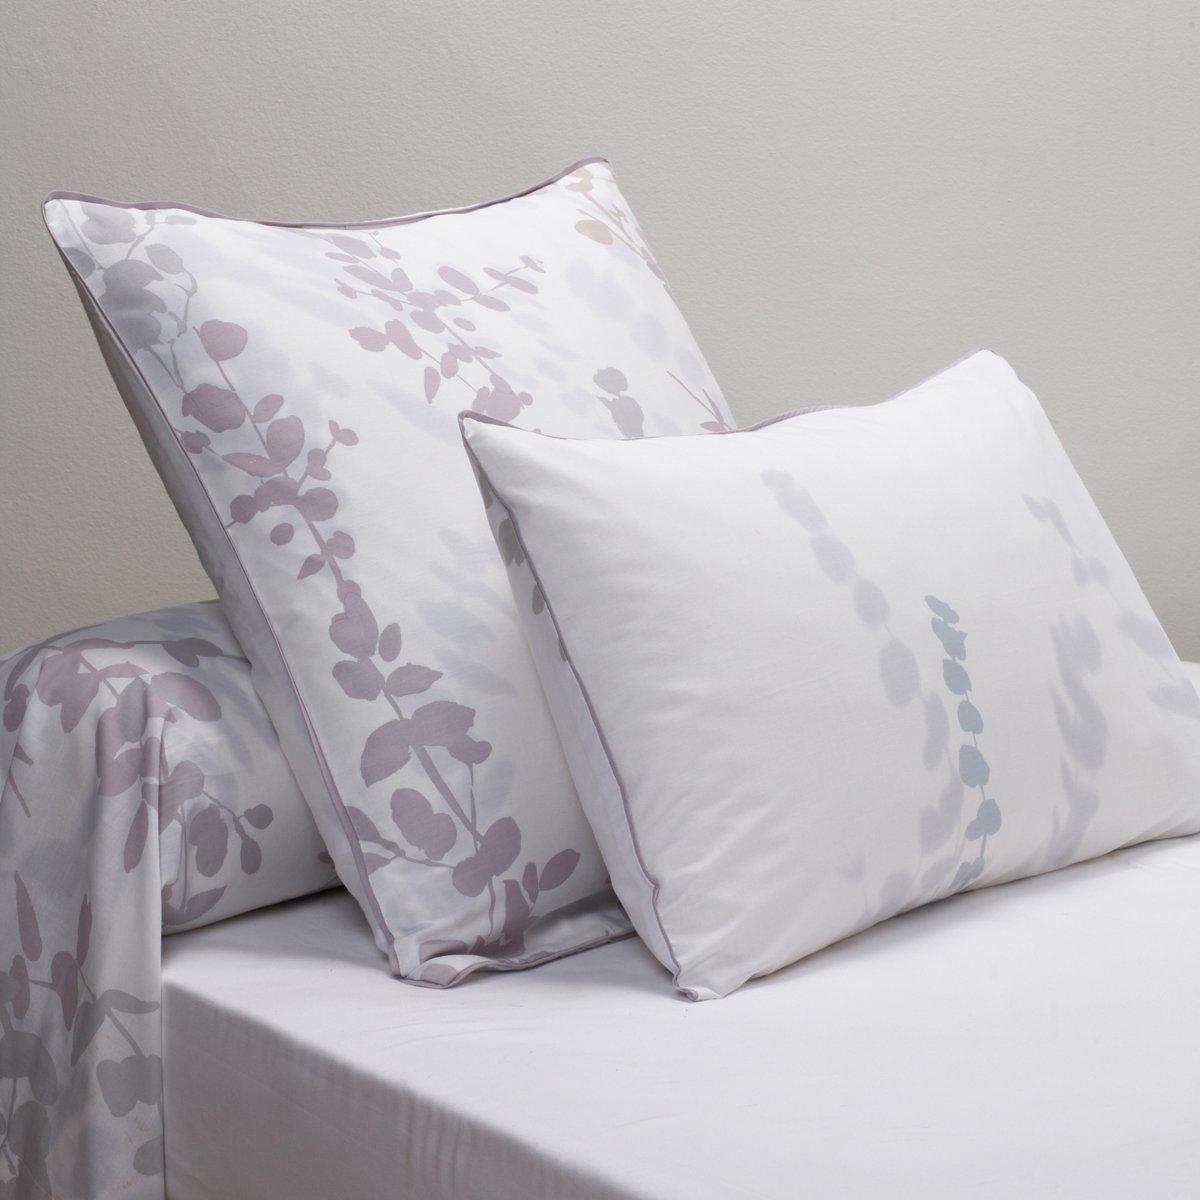 Наволочка классическая или на подушку-валик Qualite Best, KALYPTO